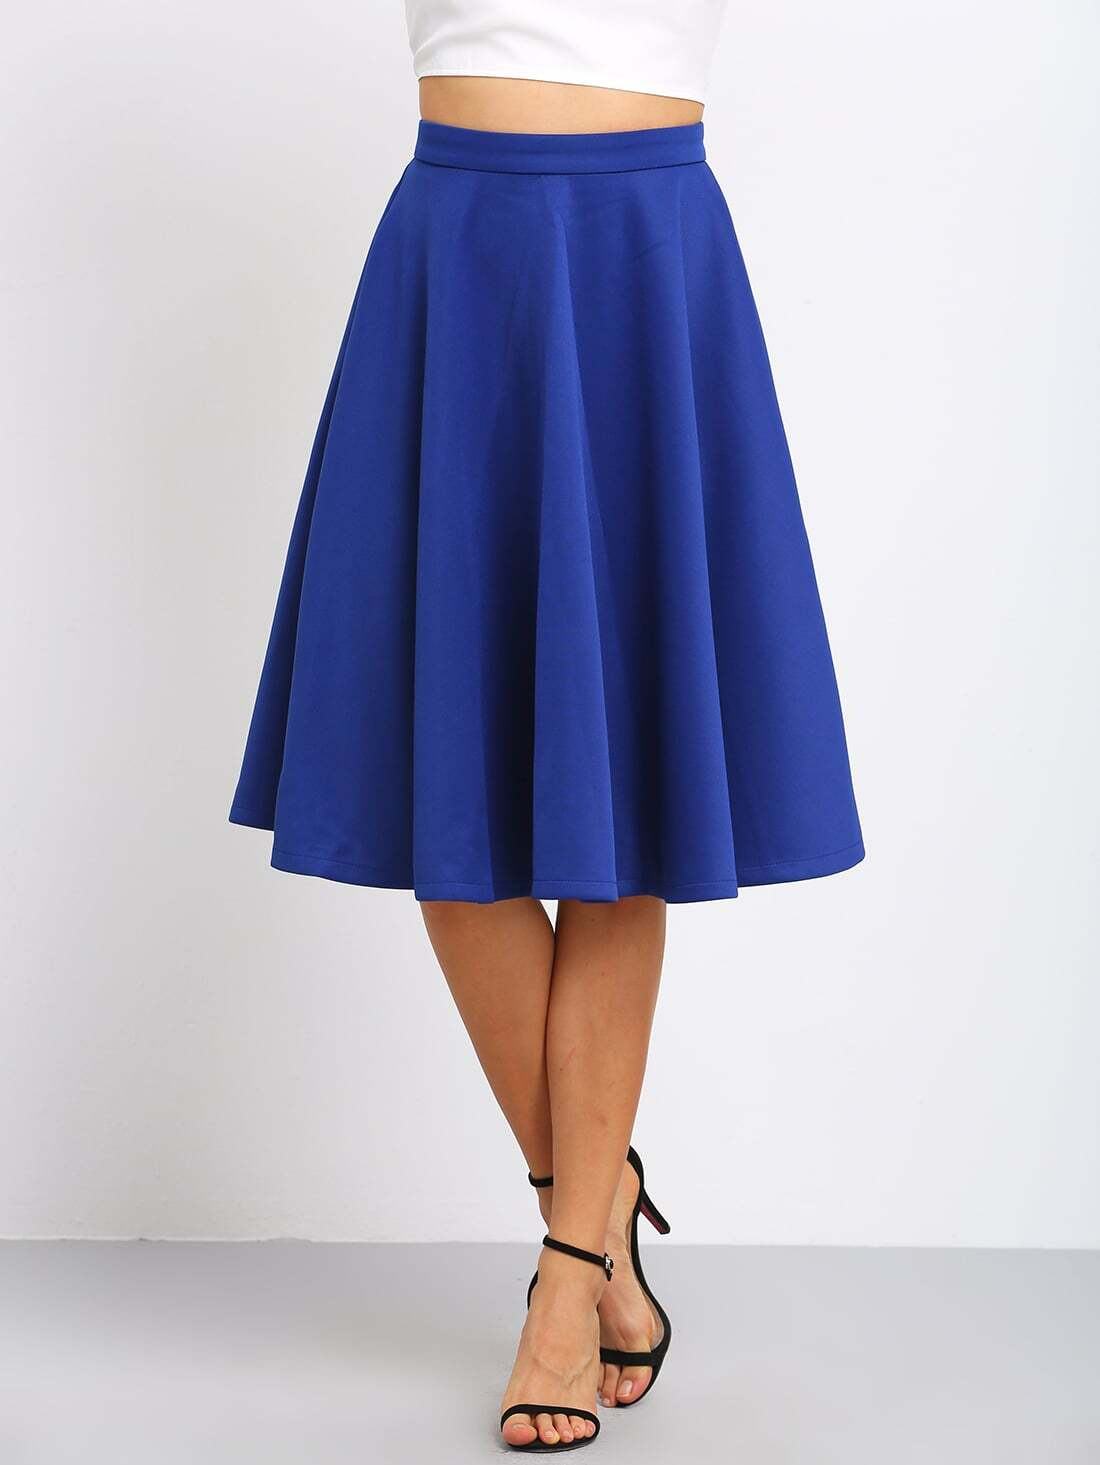 jupe longue vas e taille haute bleu french shein sheinside. Black Bedroom Furniture Sets. Home Design Ideas